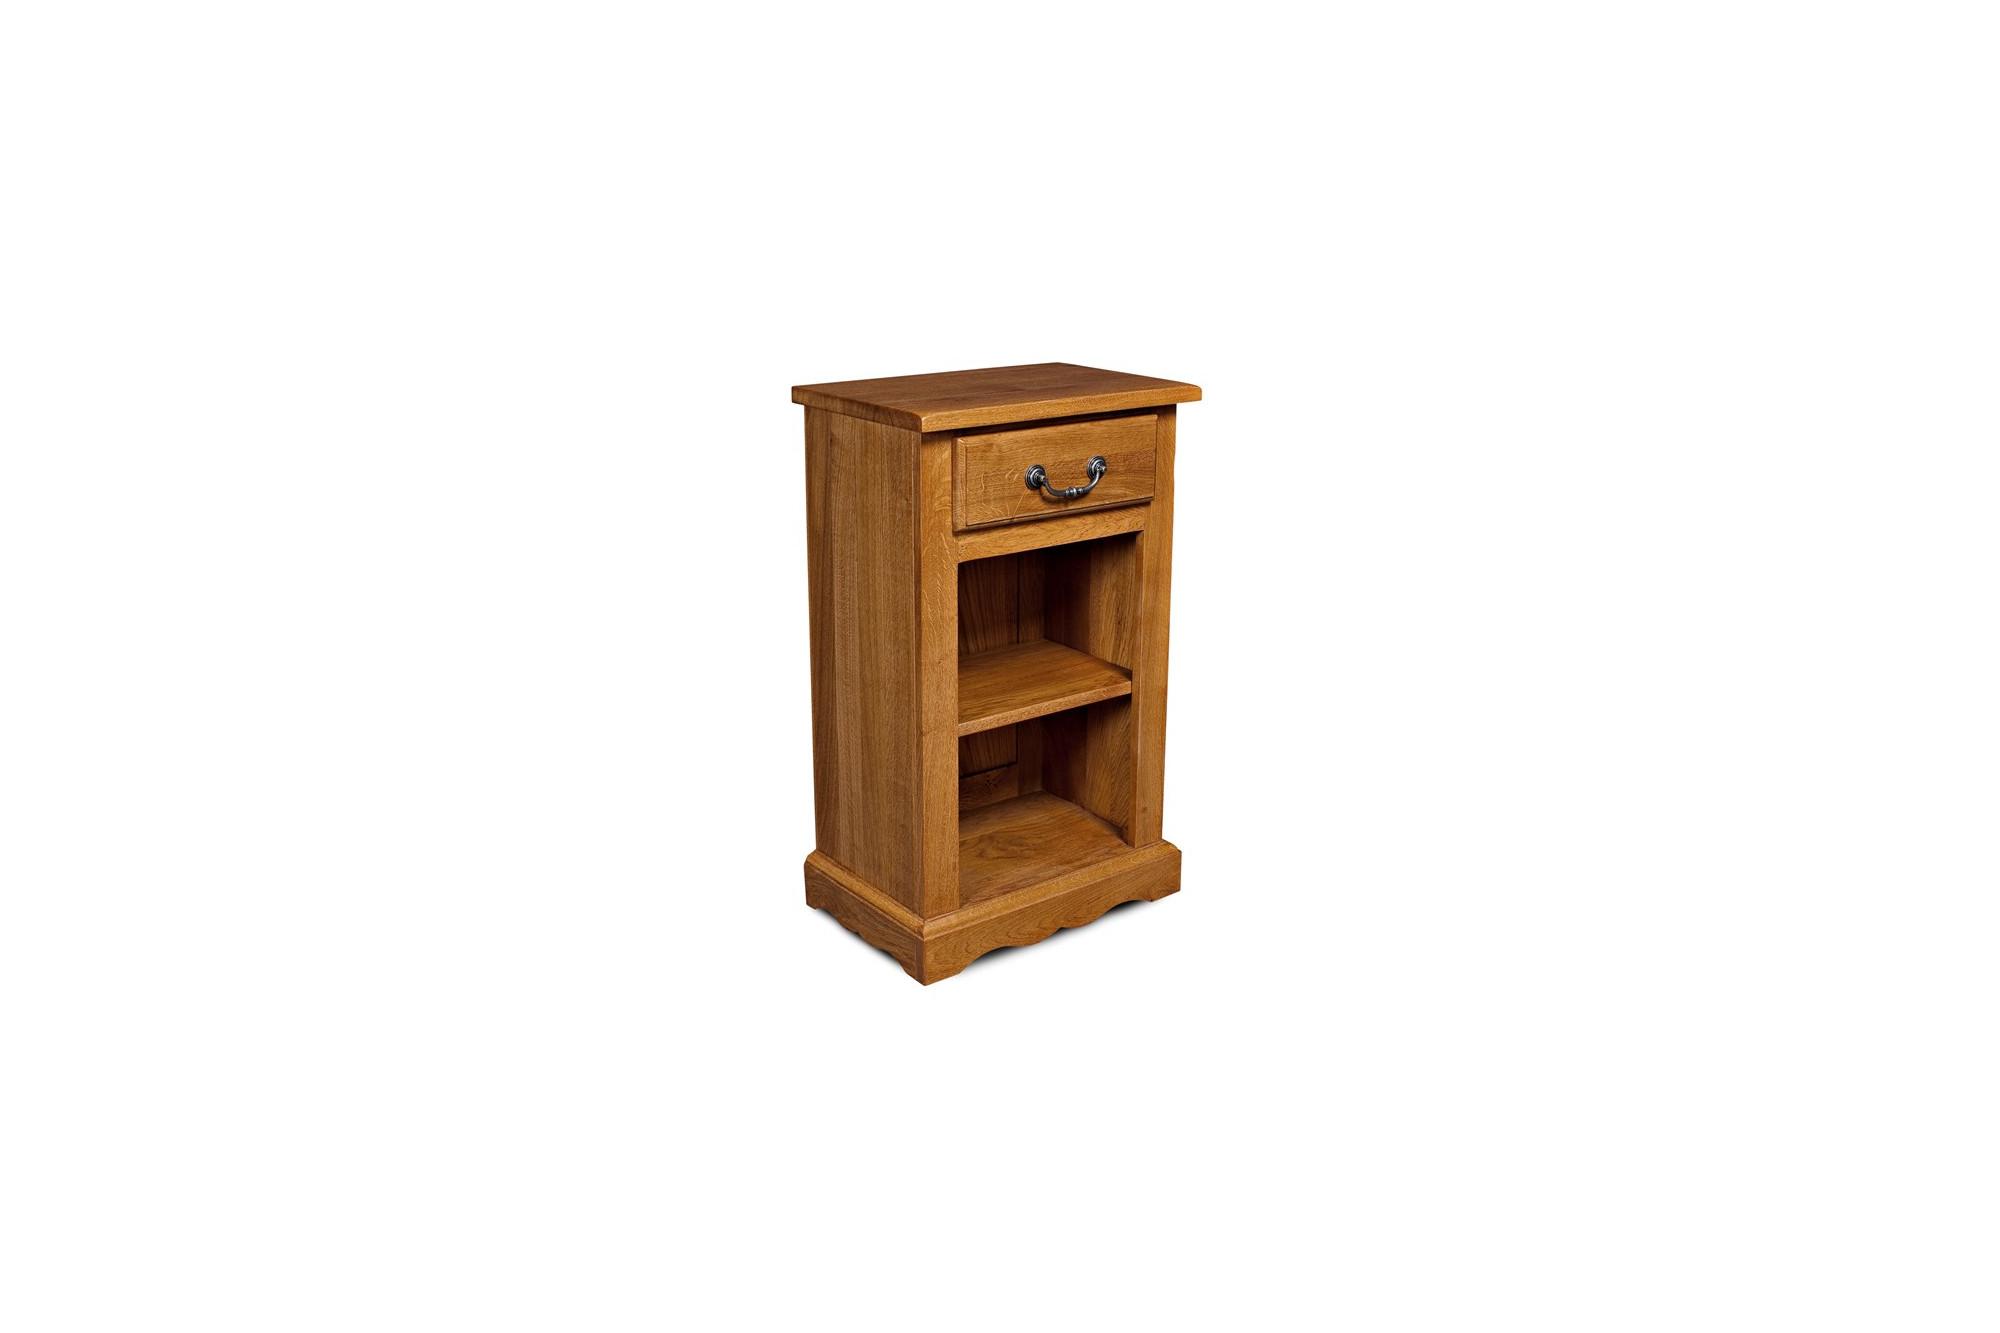 table de chevet rustique en bois massif hellin. Black Bedroom Furniture Sets. Home Design Ideas